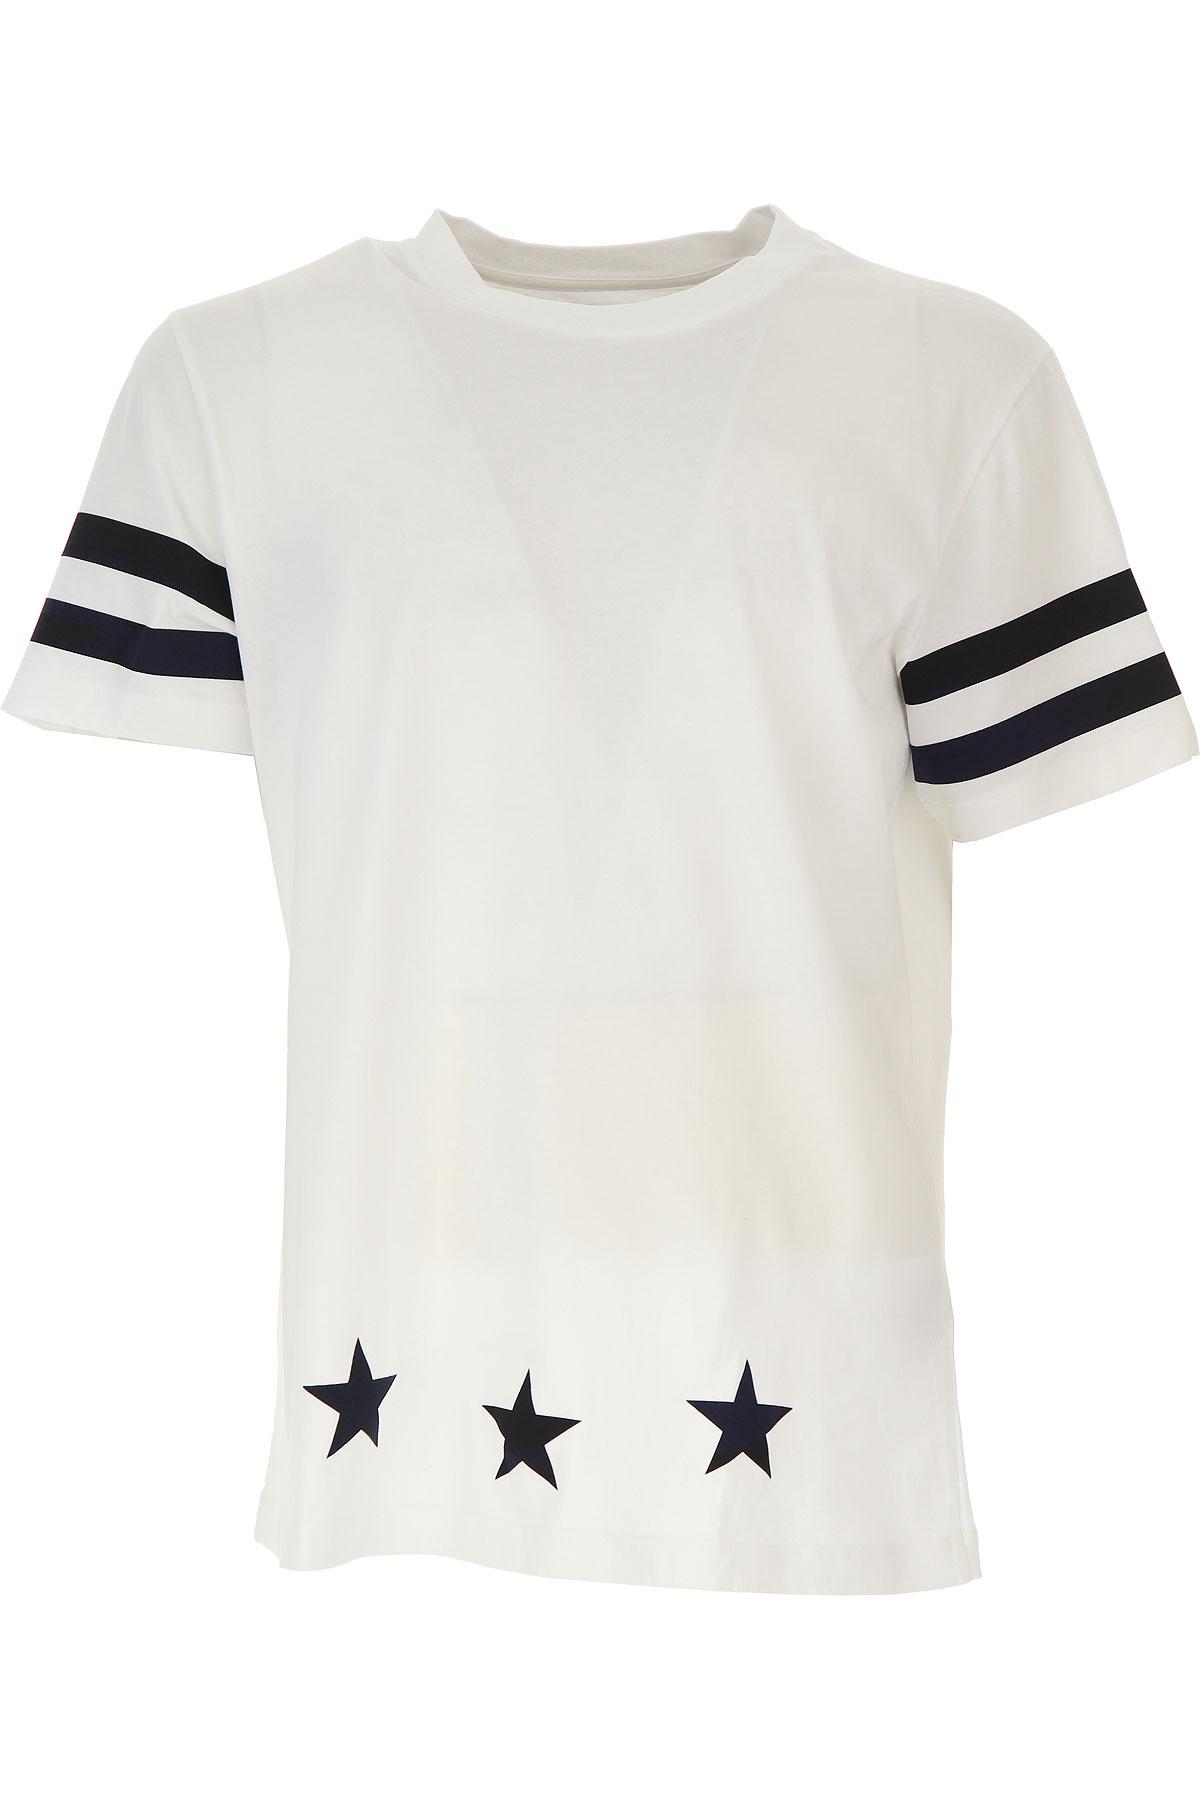 Image of Hydrogen T-Shirt for Men On Sale, White, Cotton, 2017, L M